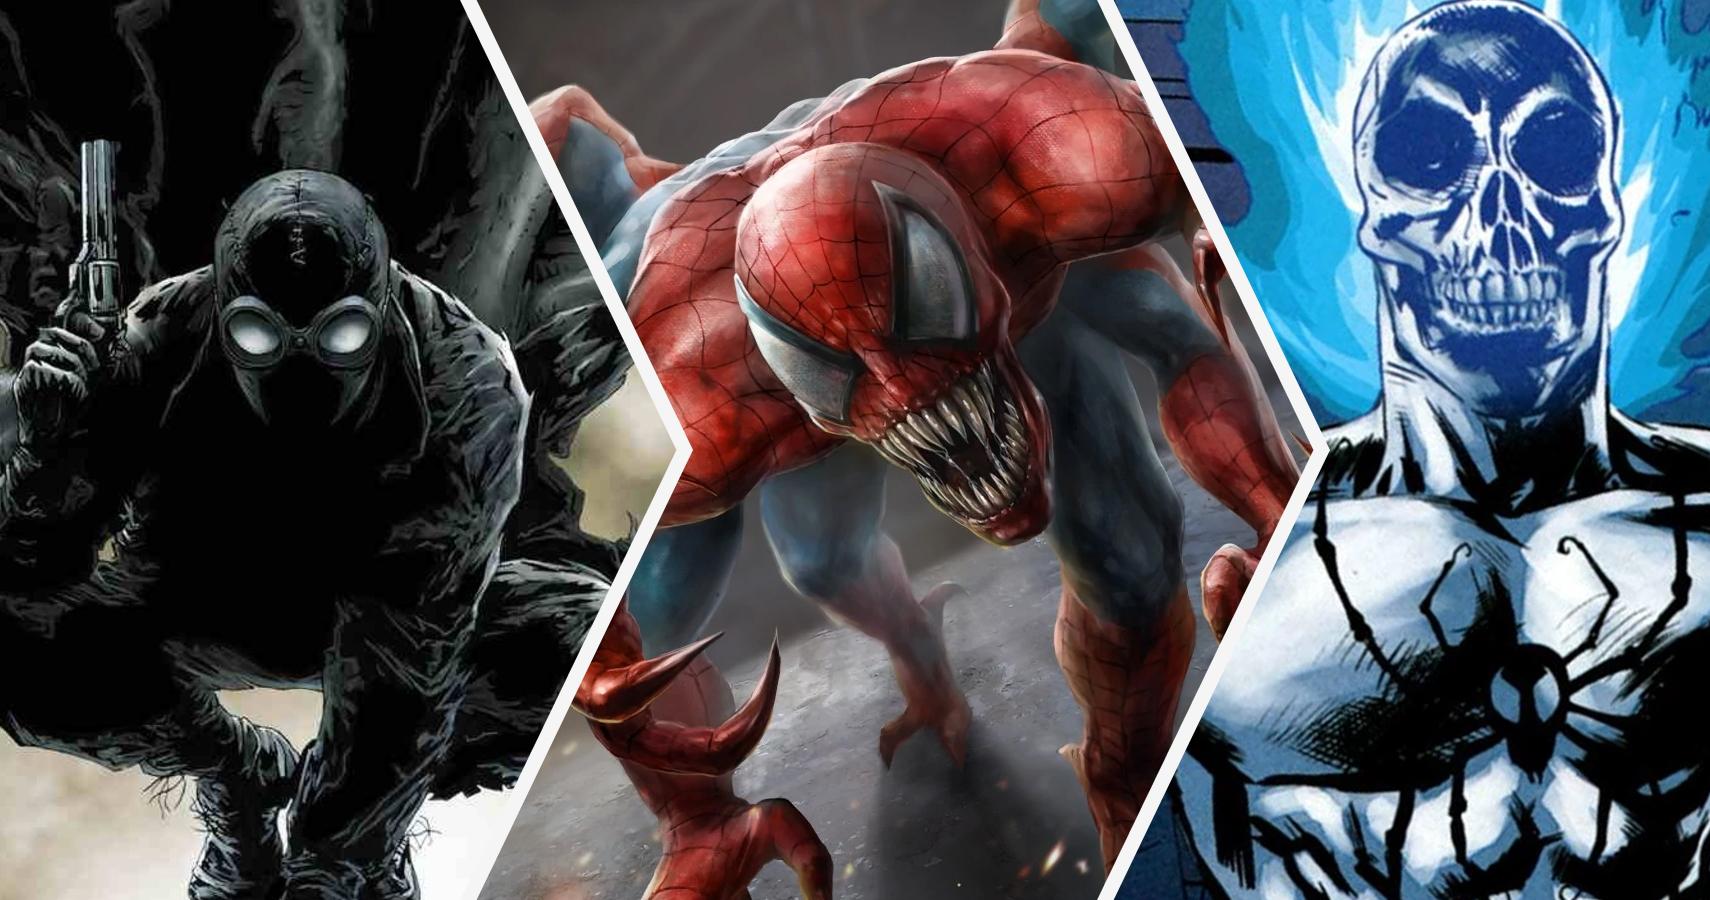 stronger and weaker dark versions of spider-man | cbr